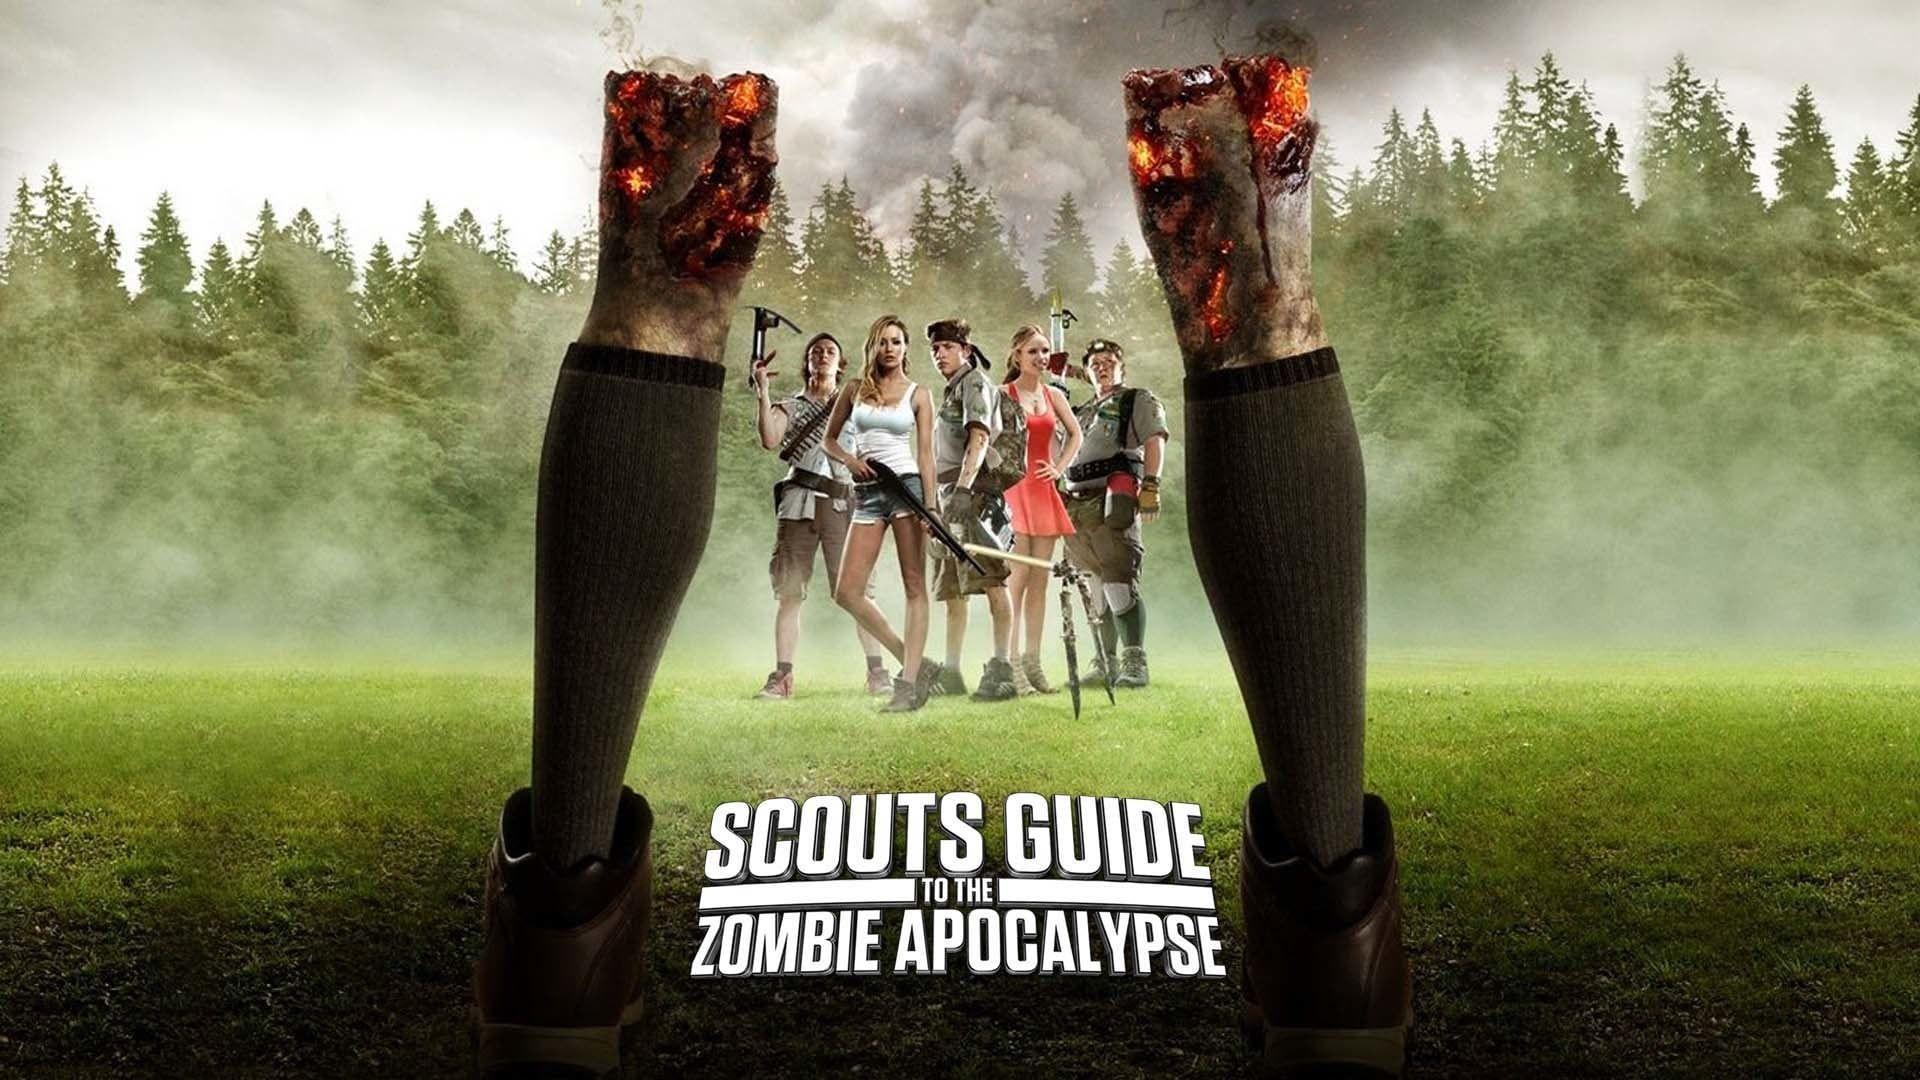 Manuale Scout Per L Apocalisse Zombie 2015 Streaming Ita Cb01 Film Completo Italiano Altadefinizione Tre Gio Free Movies Online Zombie Apocalypse Movies Online